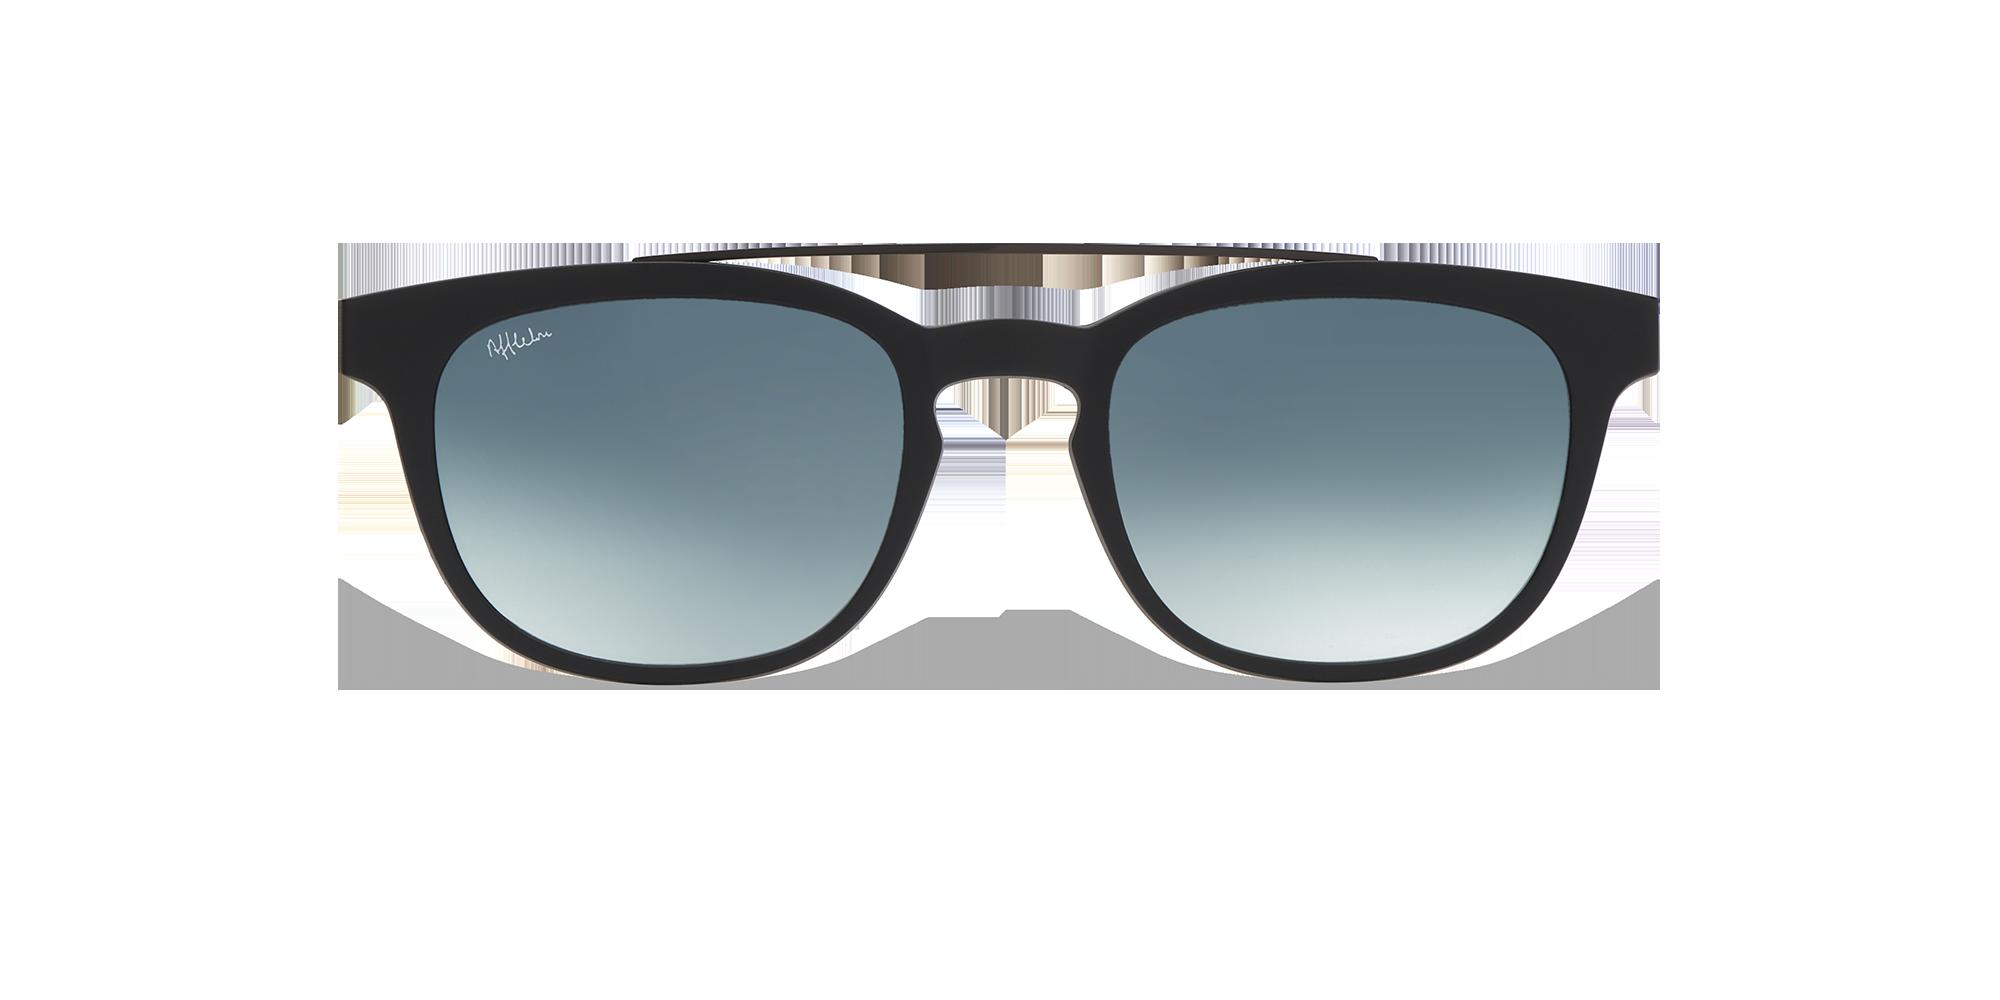 afflelou/france/products/smart_clip/clips_glasses/TMK33TBBK015120.png